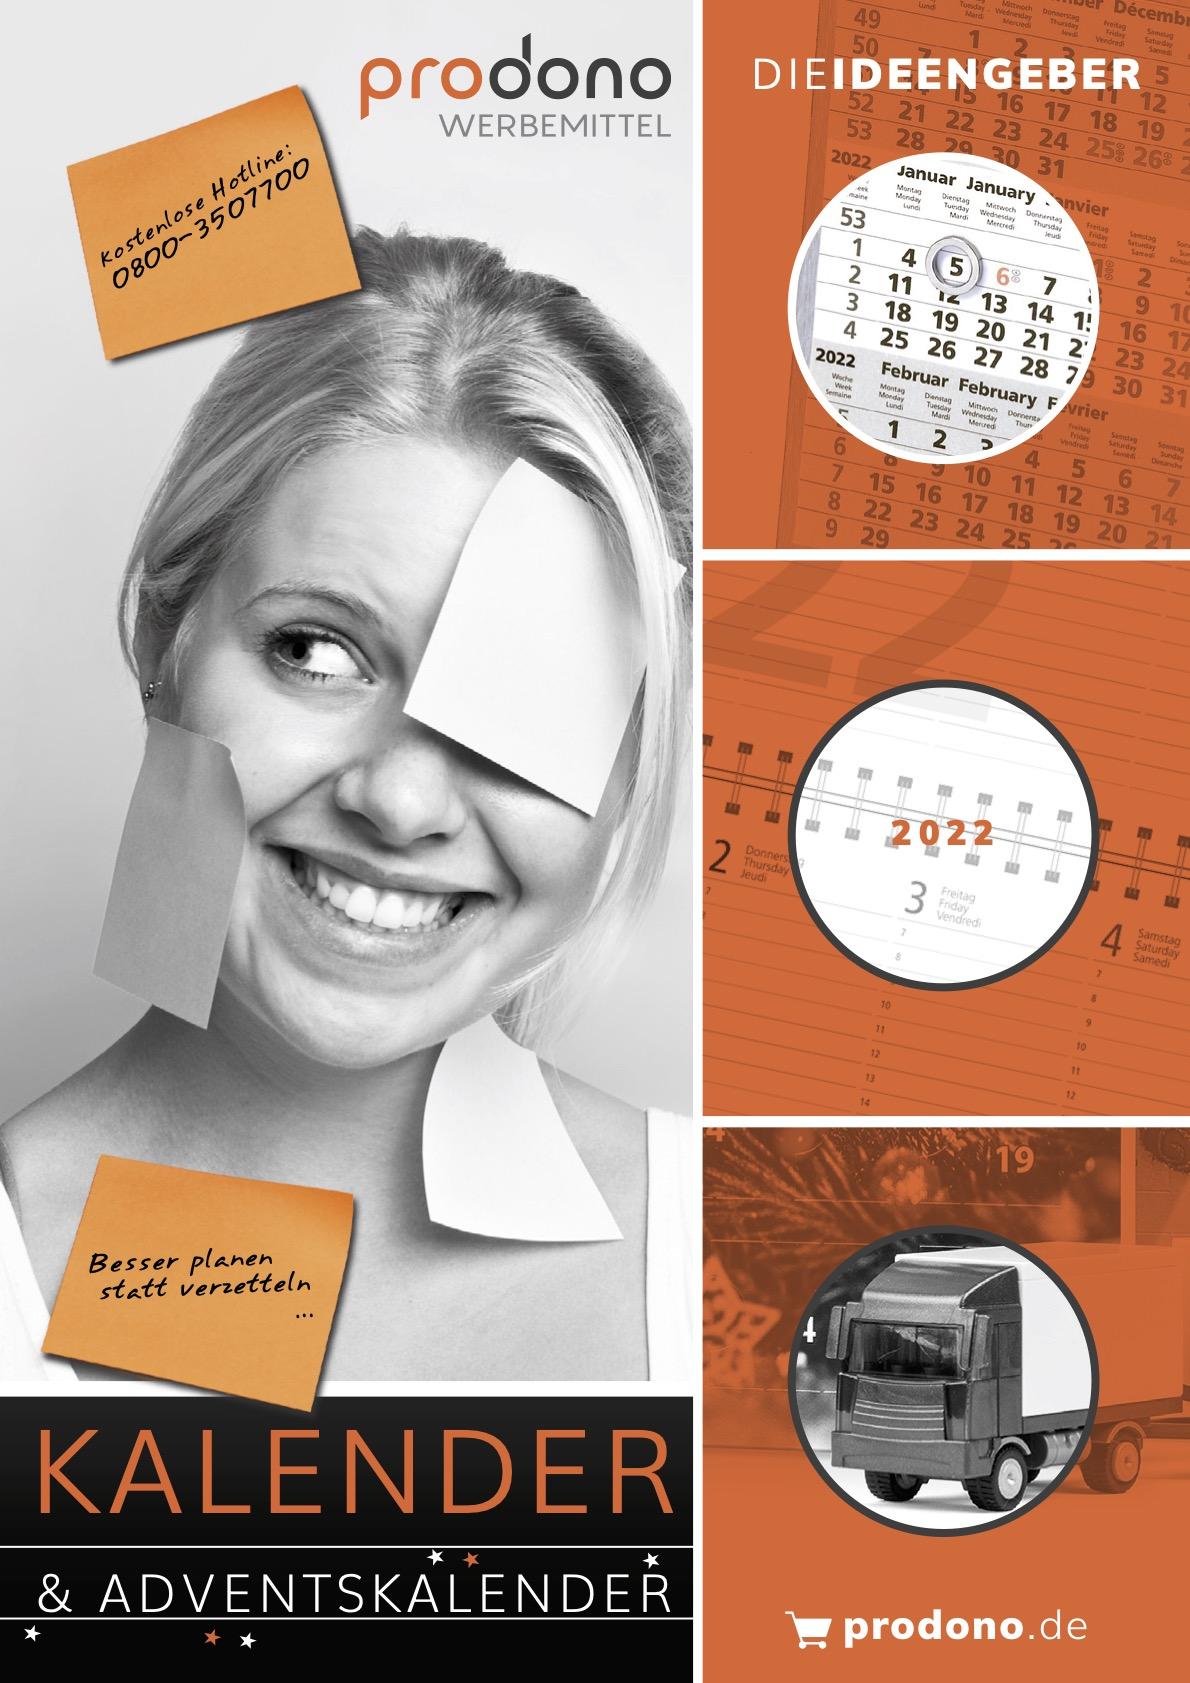 Katalog Kalender 2022